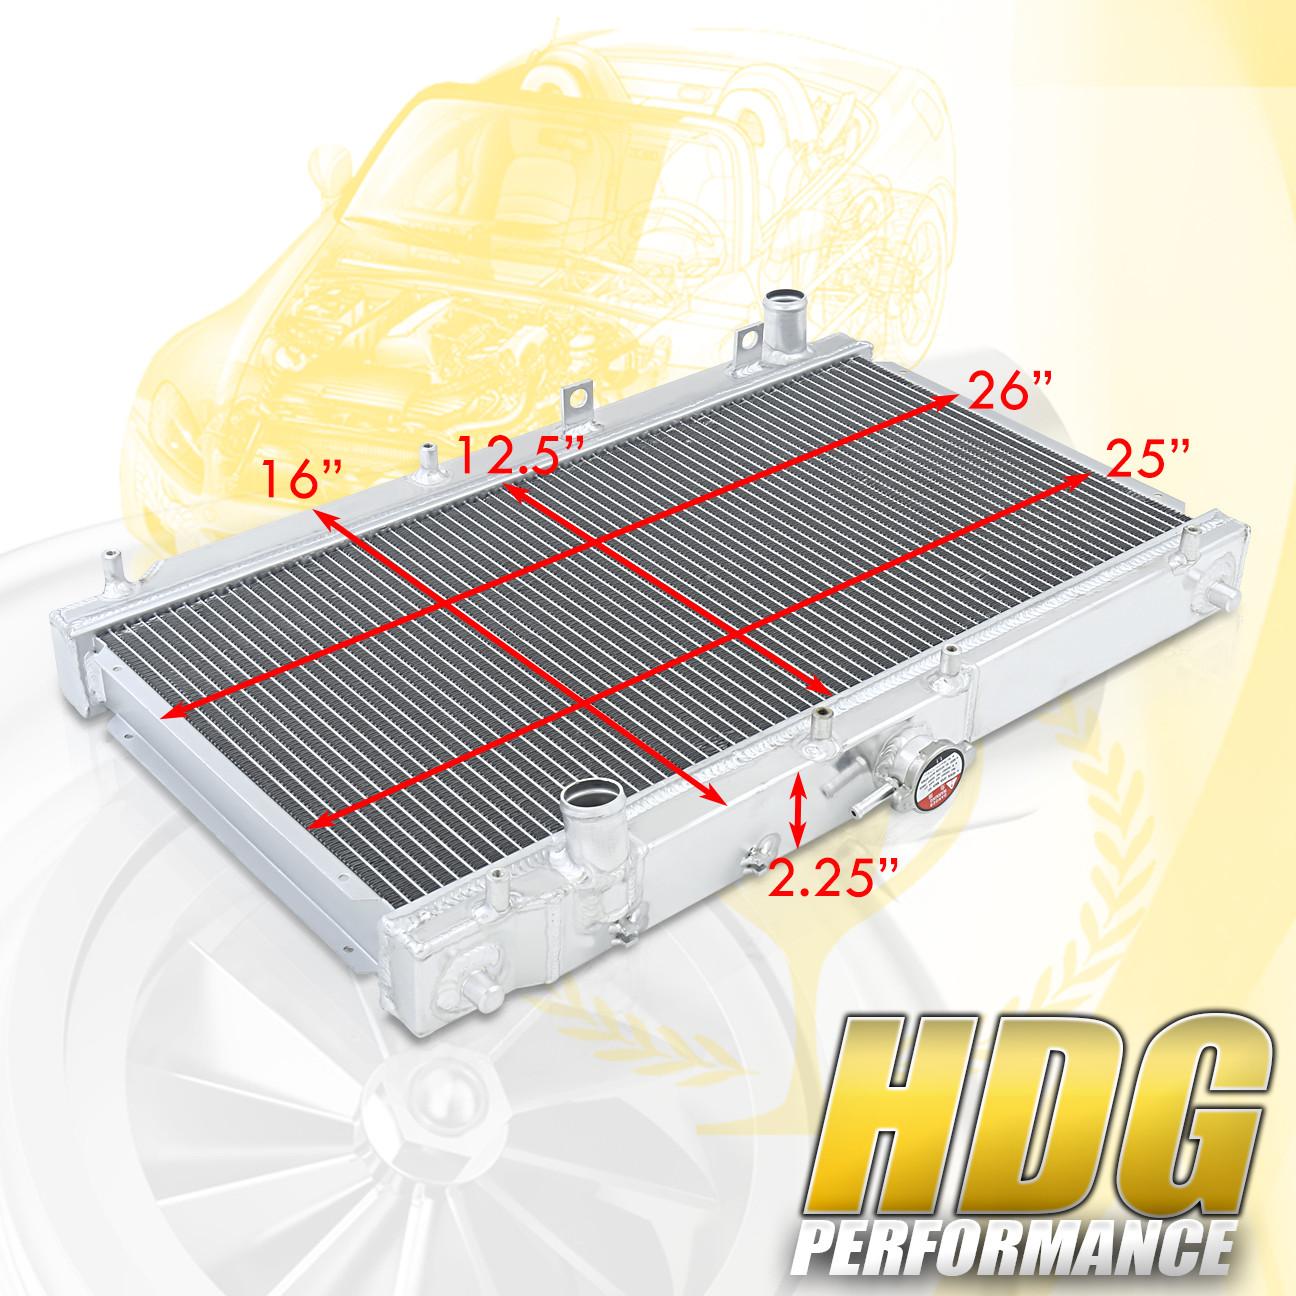 Jdm Dual Core Manual Transmission Aluminum Radiator For 99-05 Mx5 Mt Mazda Miata